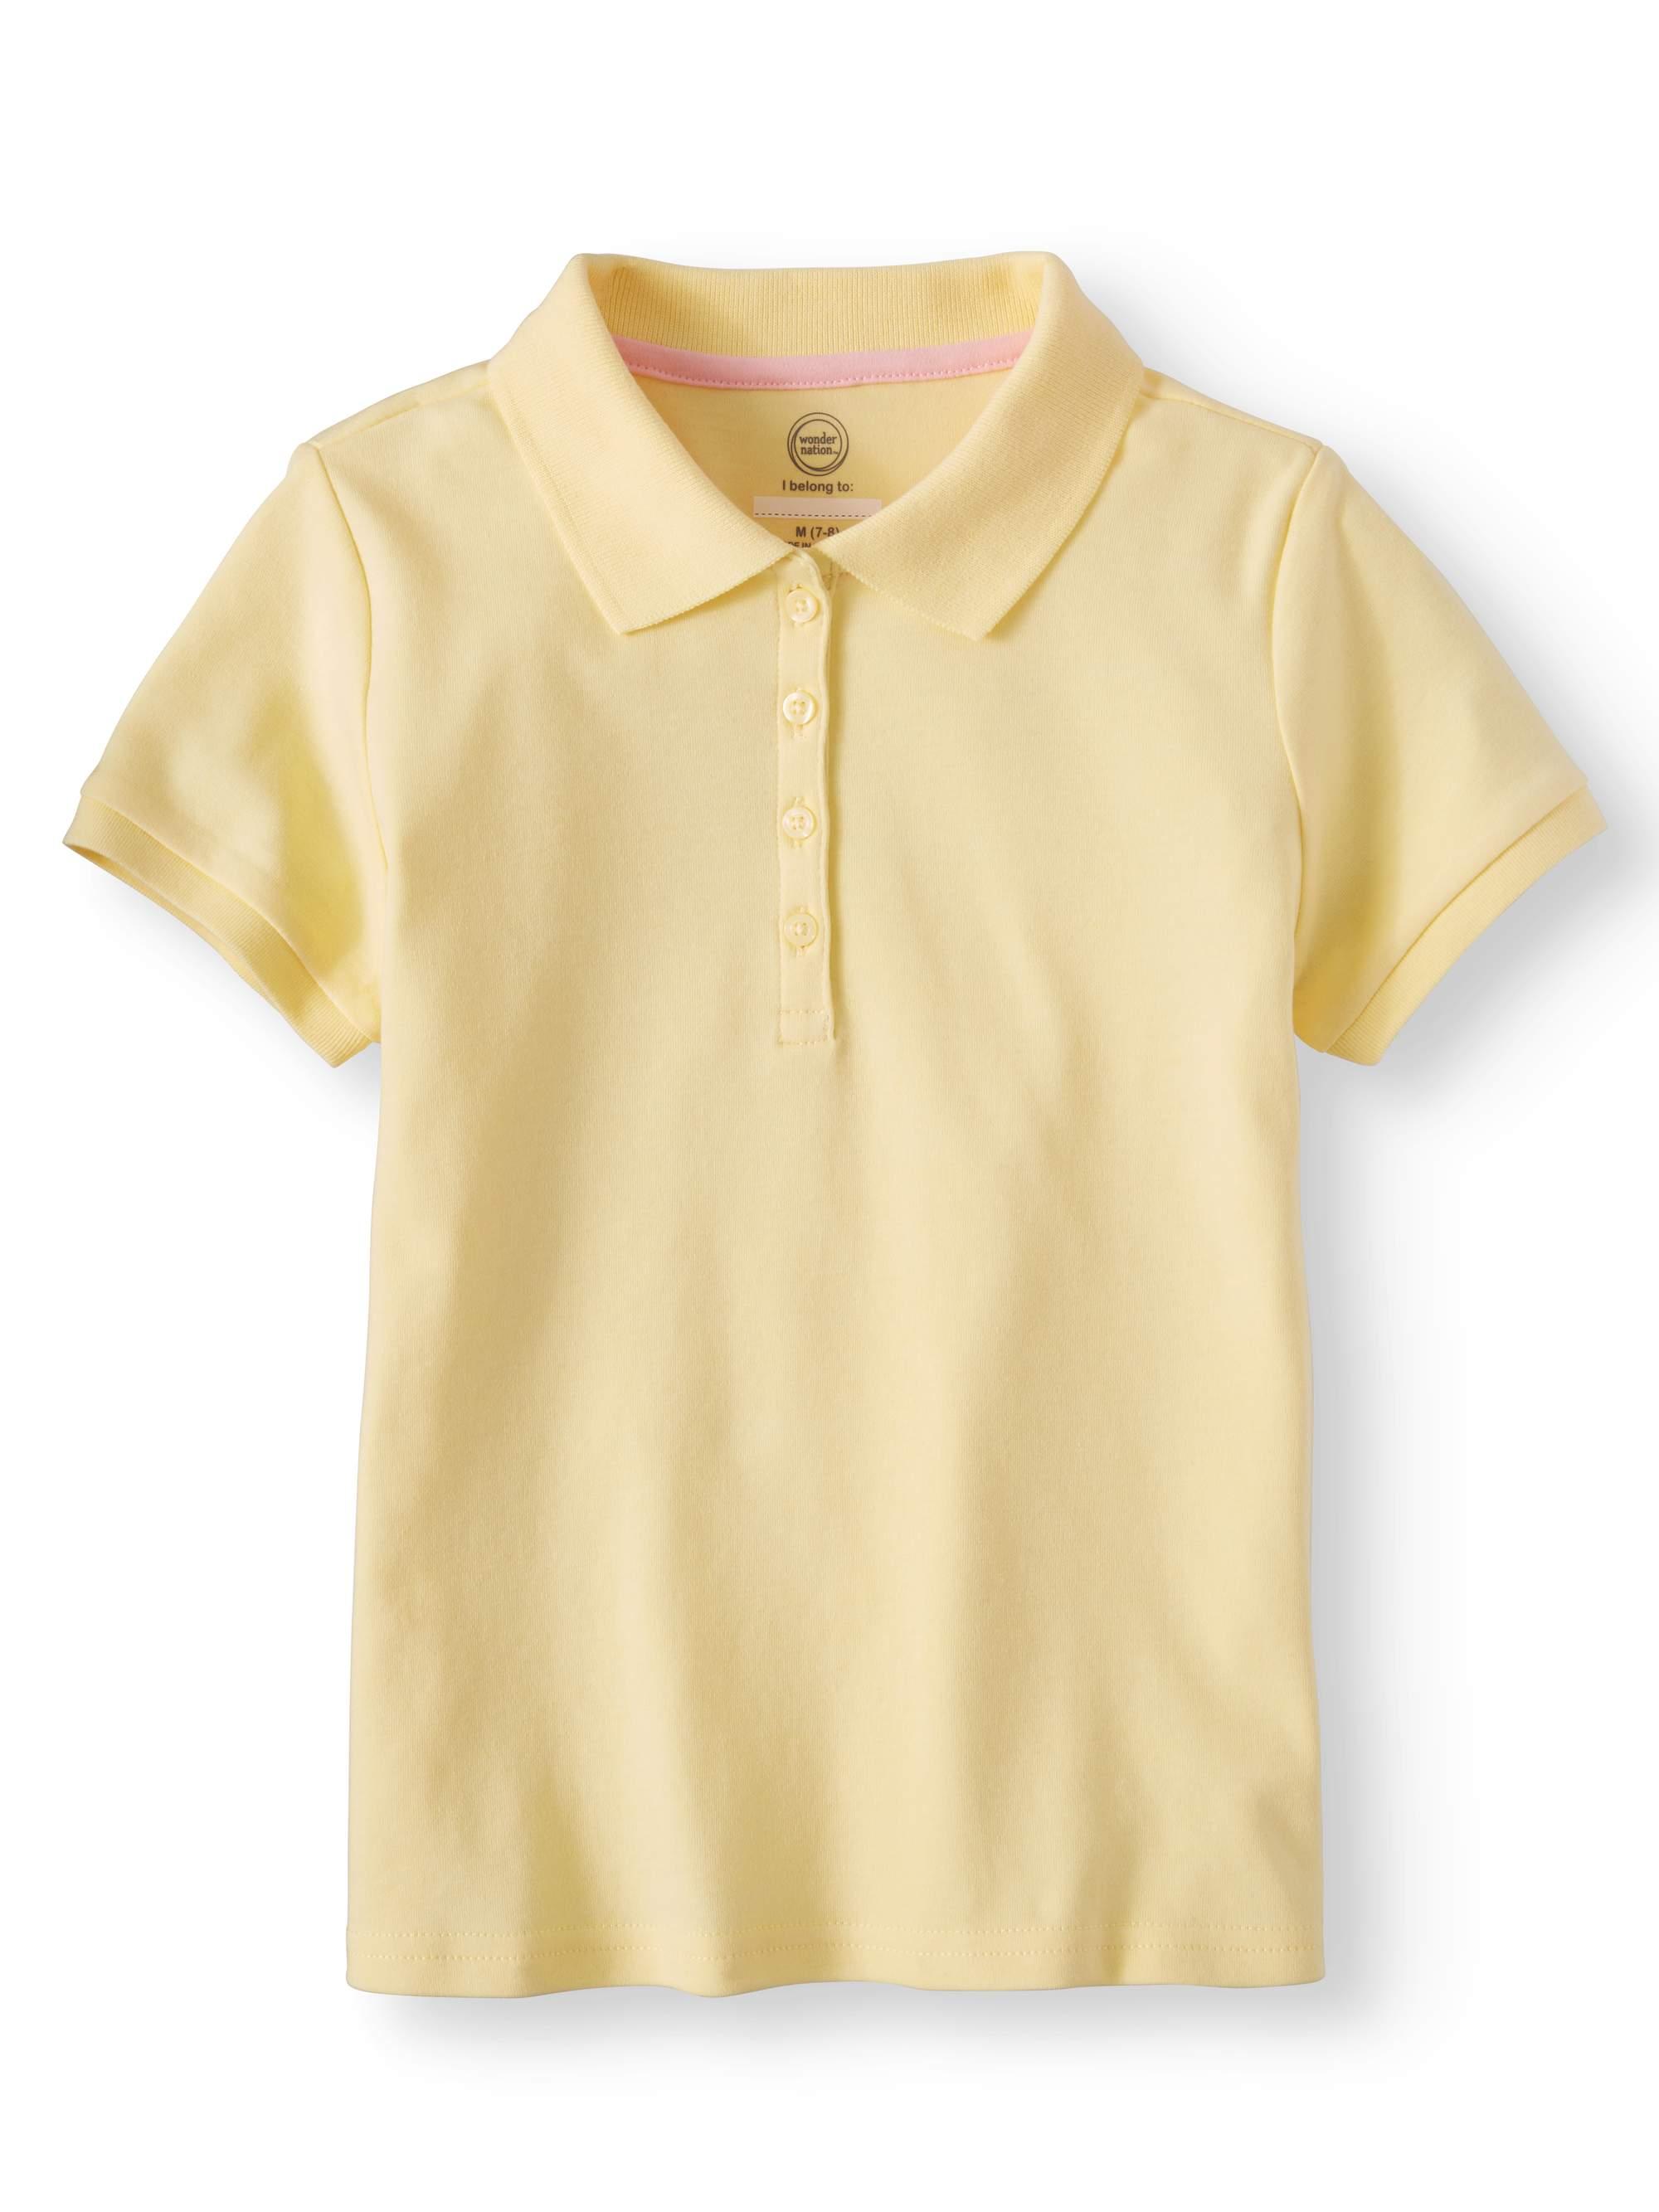 Girls School Uniform Short Sleeve Interlock Polo